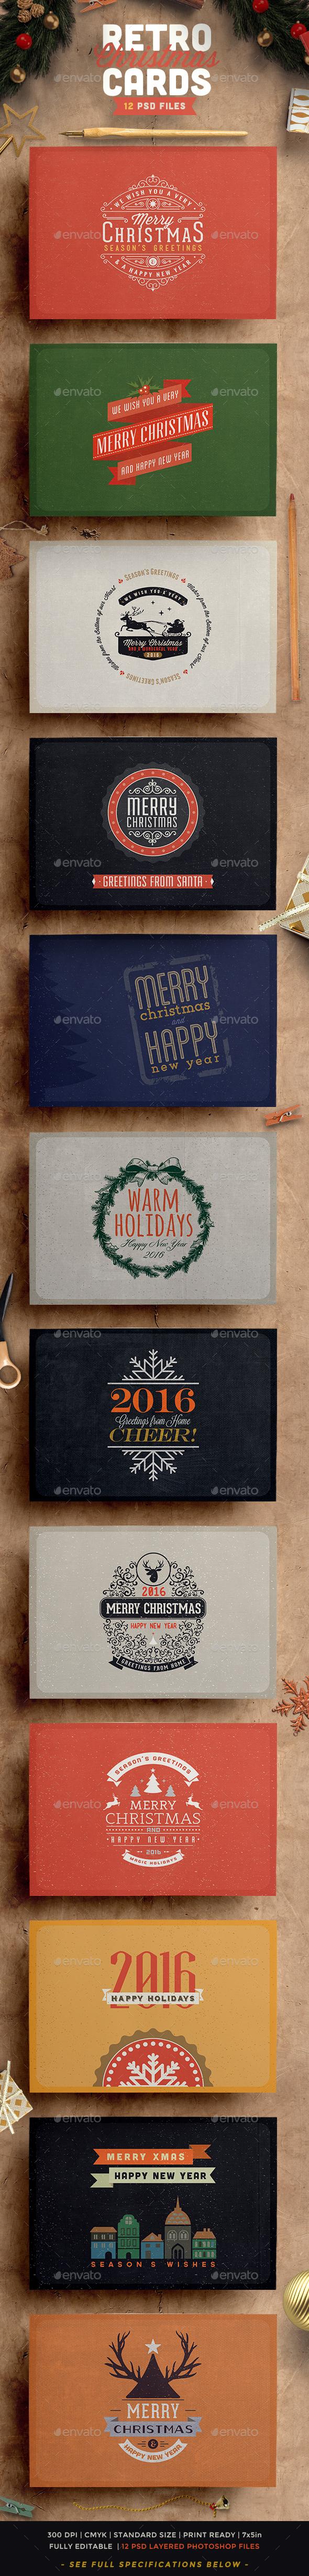 Retro / Vintage Christmas Card Pack